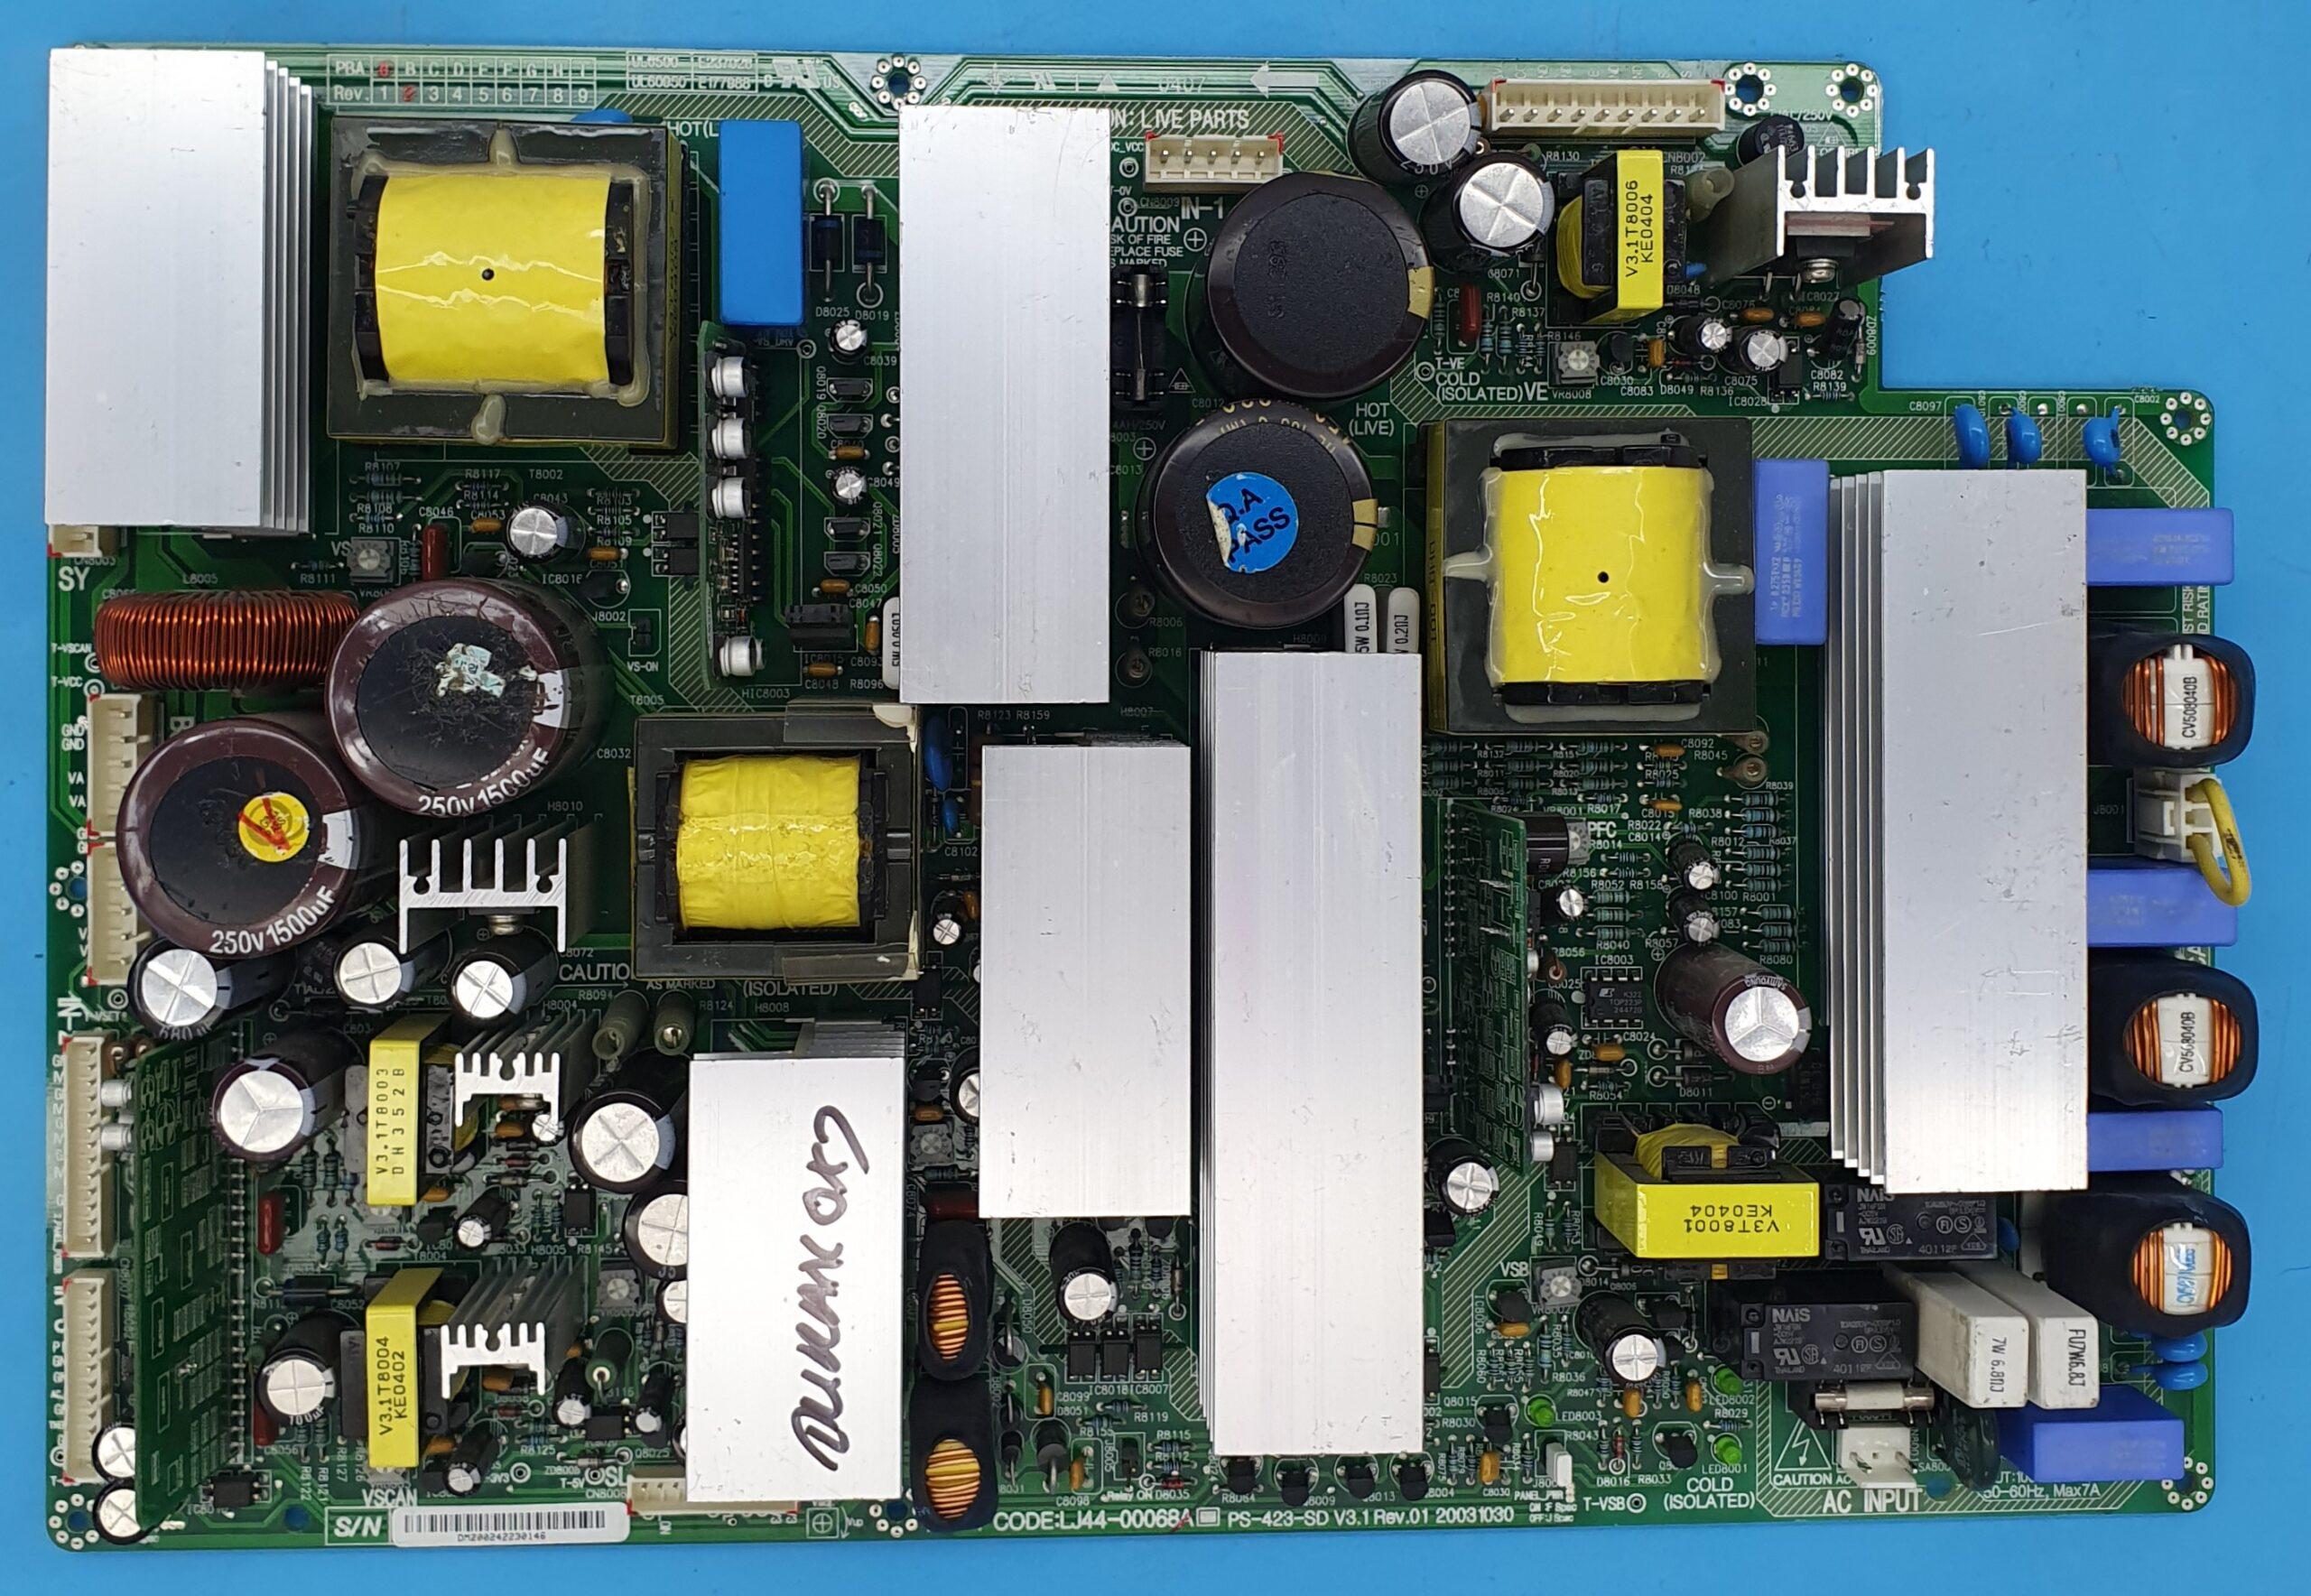 LJ44-00068A Samsung Power (KDV DAHİL = 180 TL)